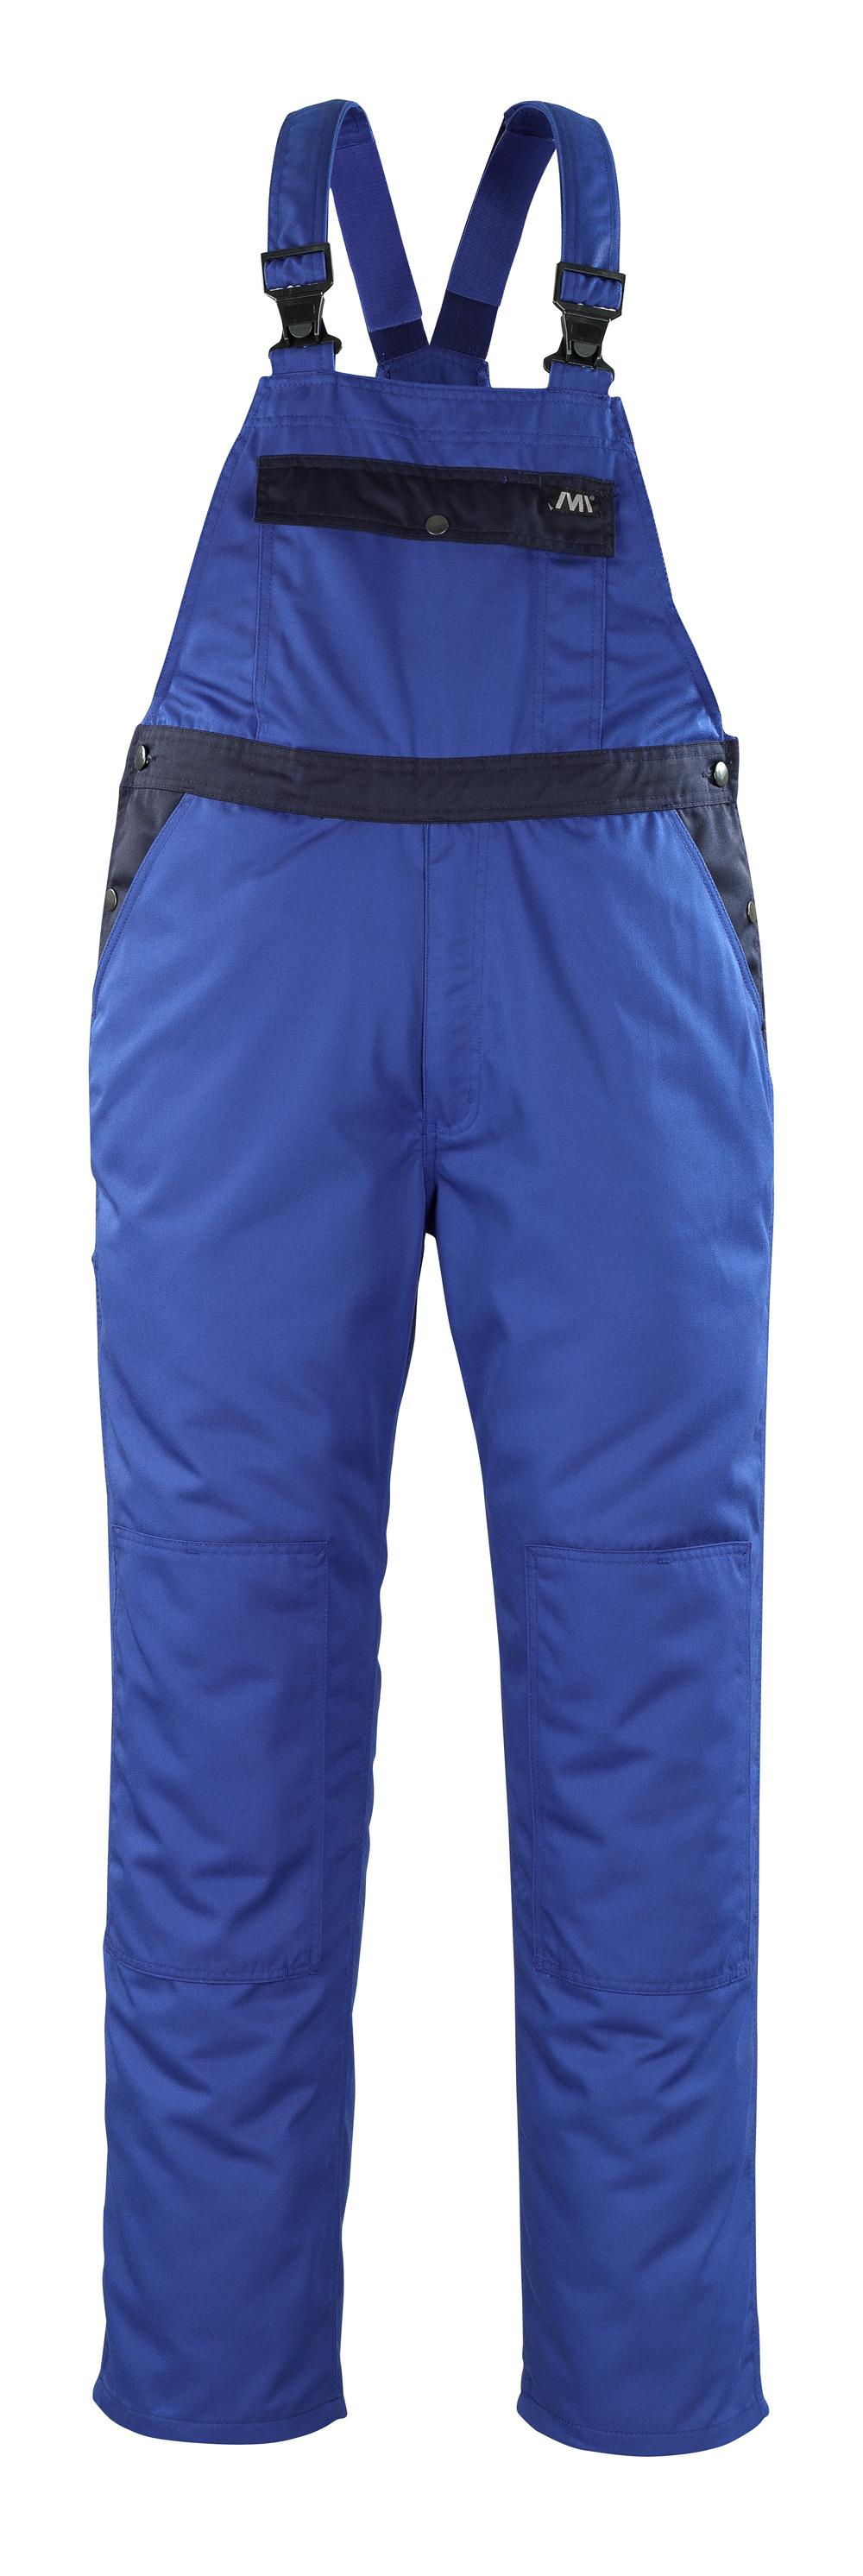 04569-800-1101 Salopette avec poches genouillères - Bleu roi/Marine